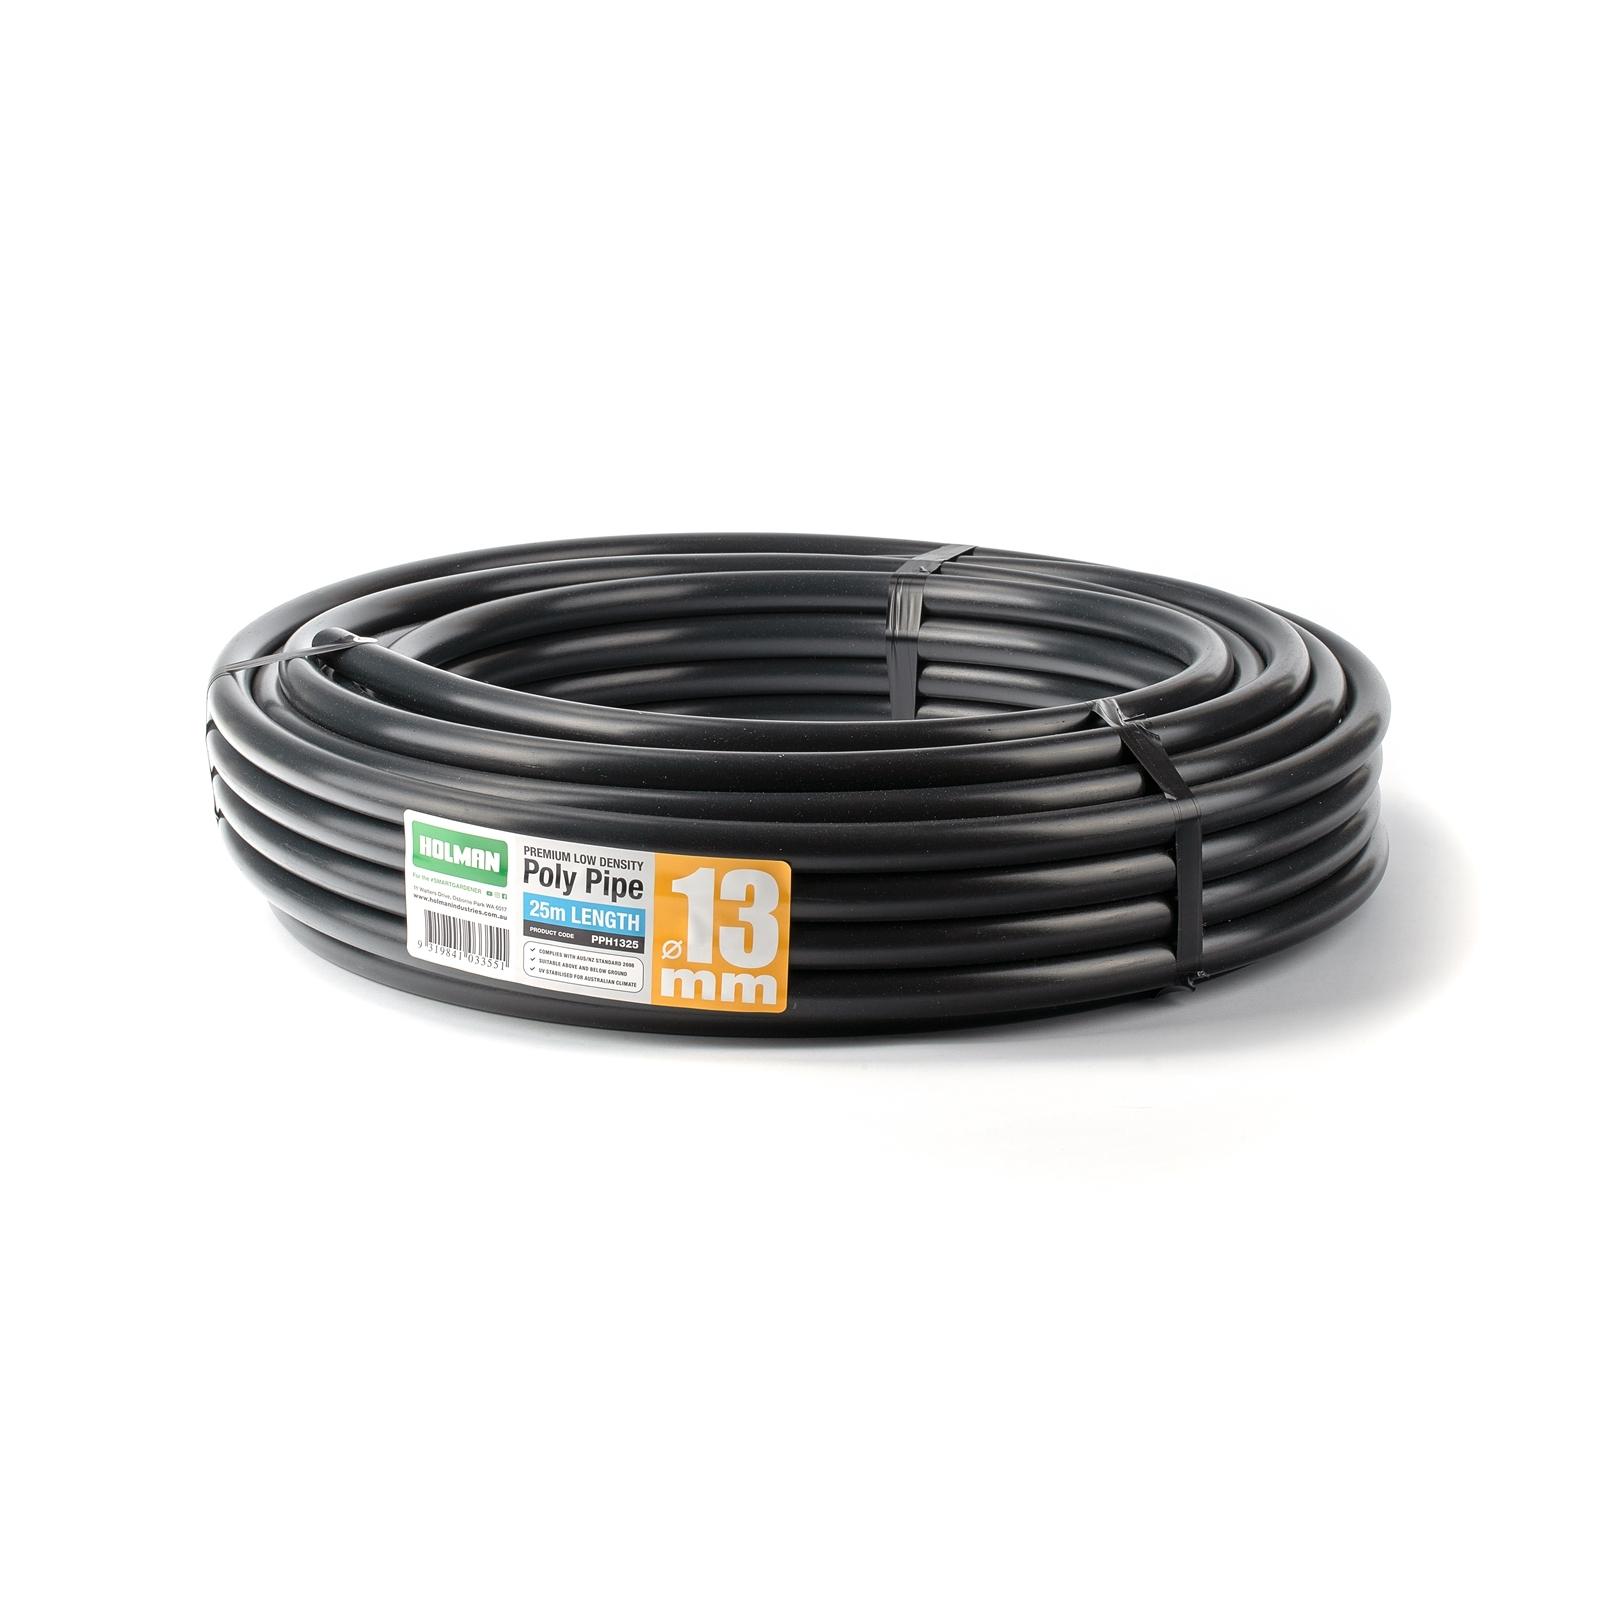 Holman 13mm x 25m Black Poly Pipe